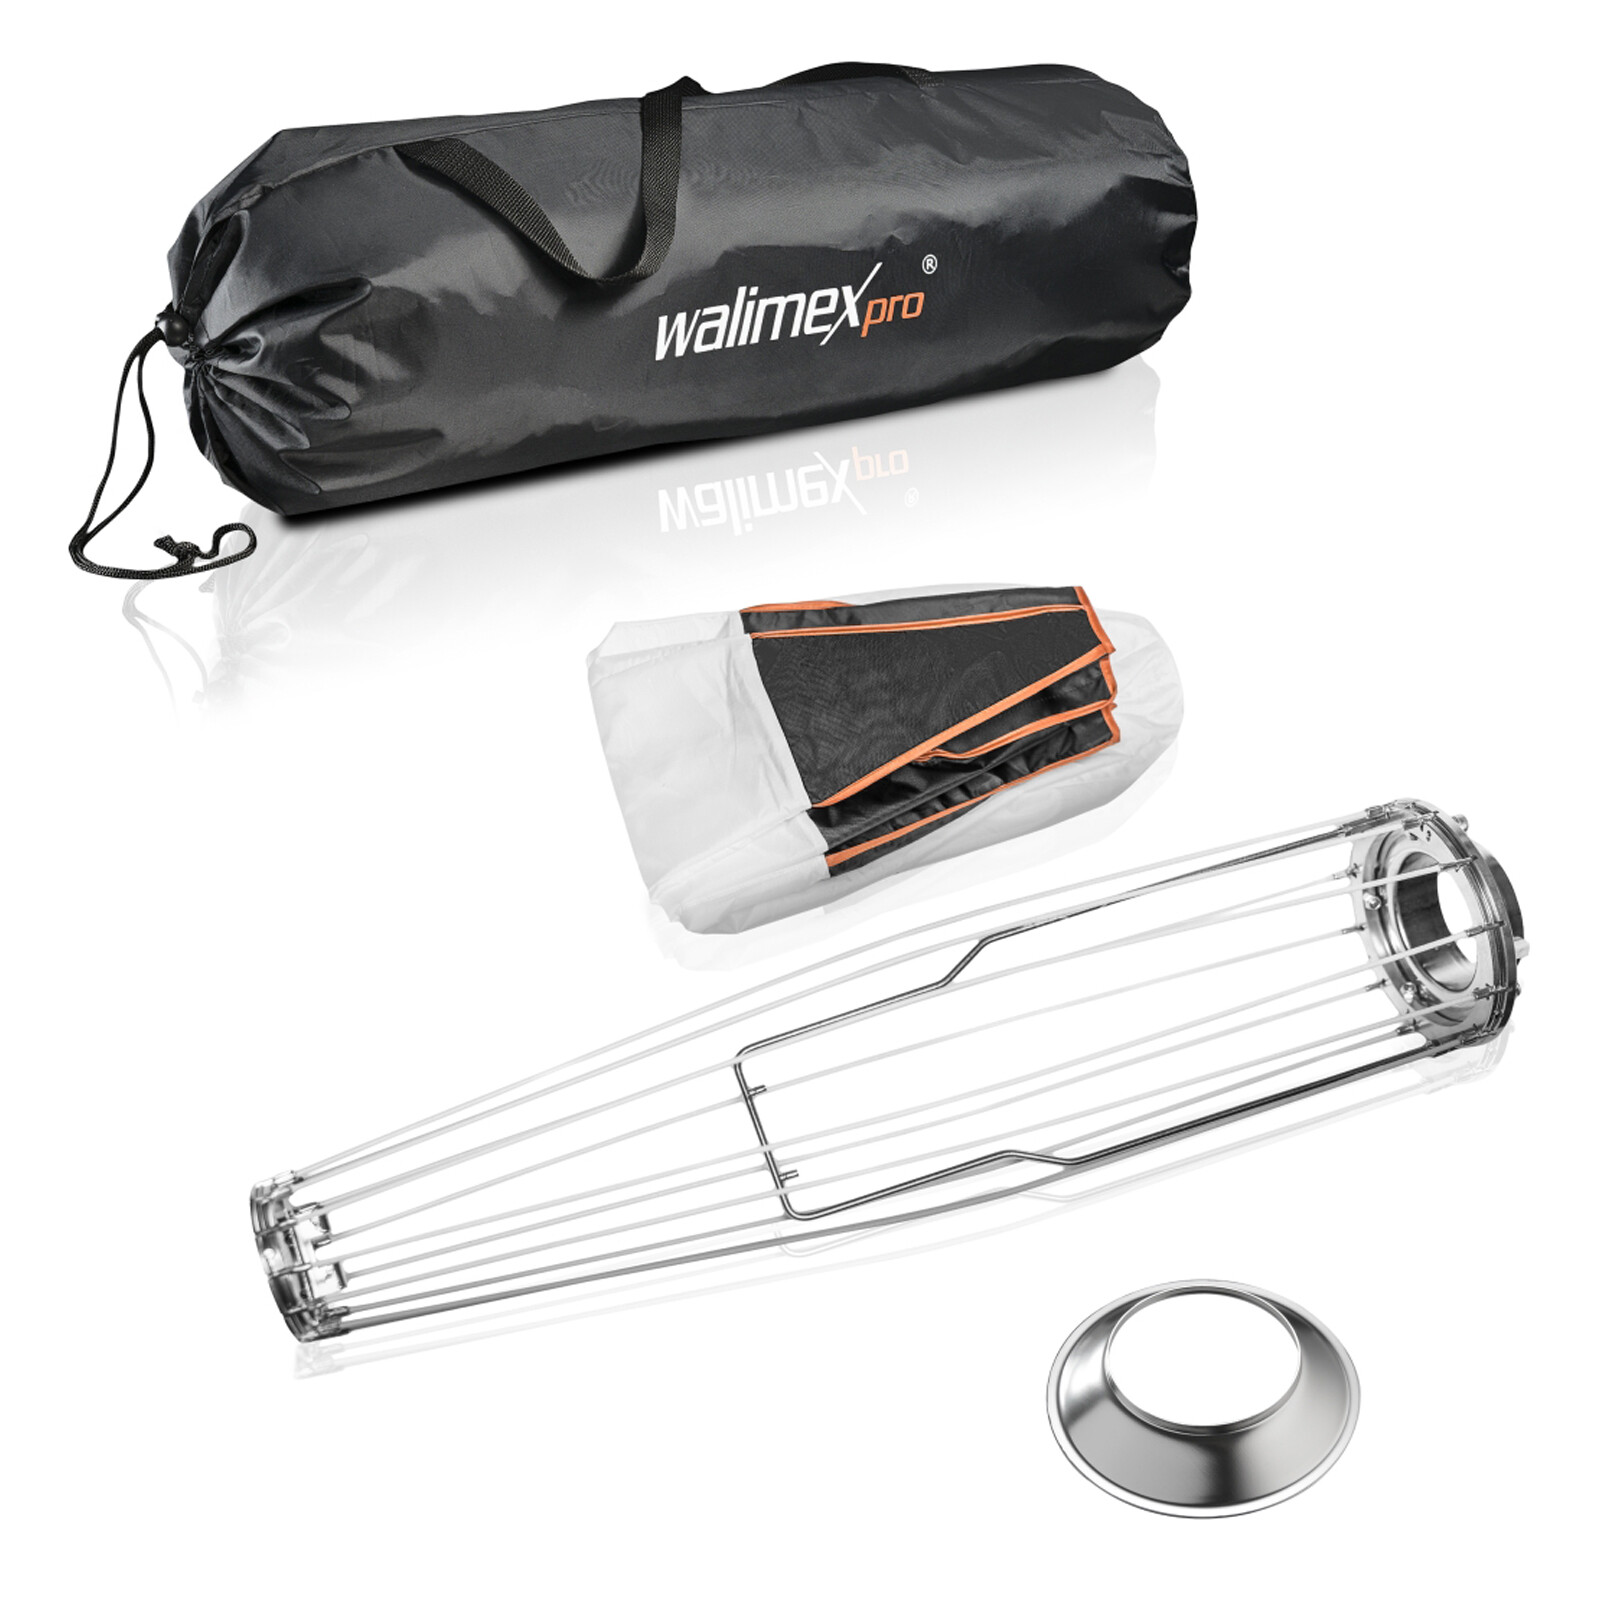 Walimex pro 360° Ambient Light Softbox 50cm Balcar